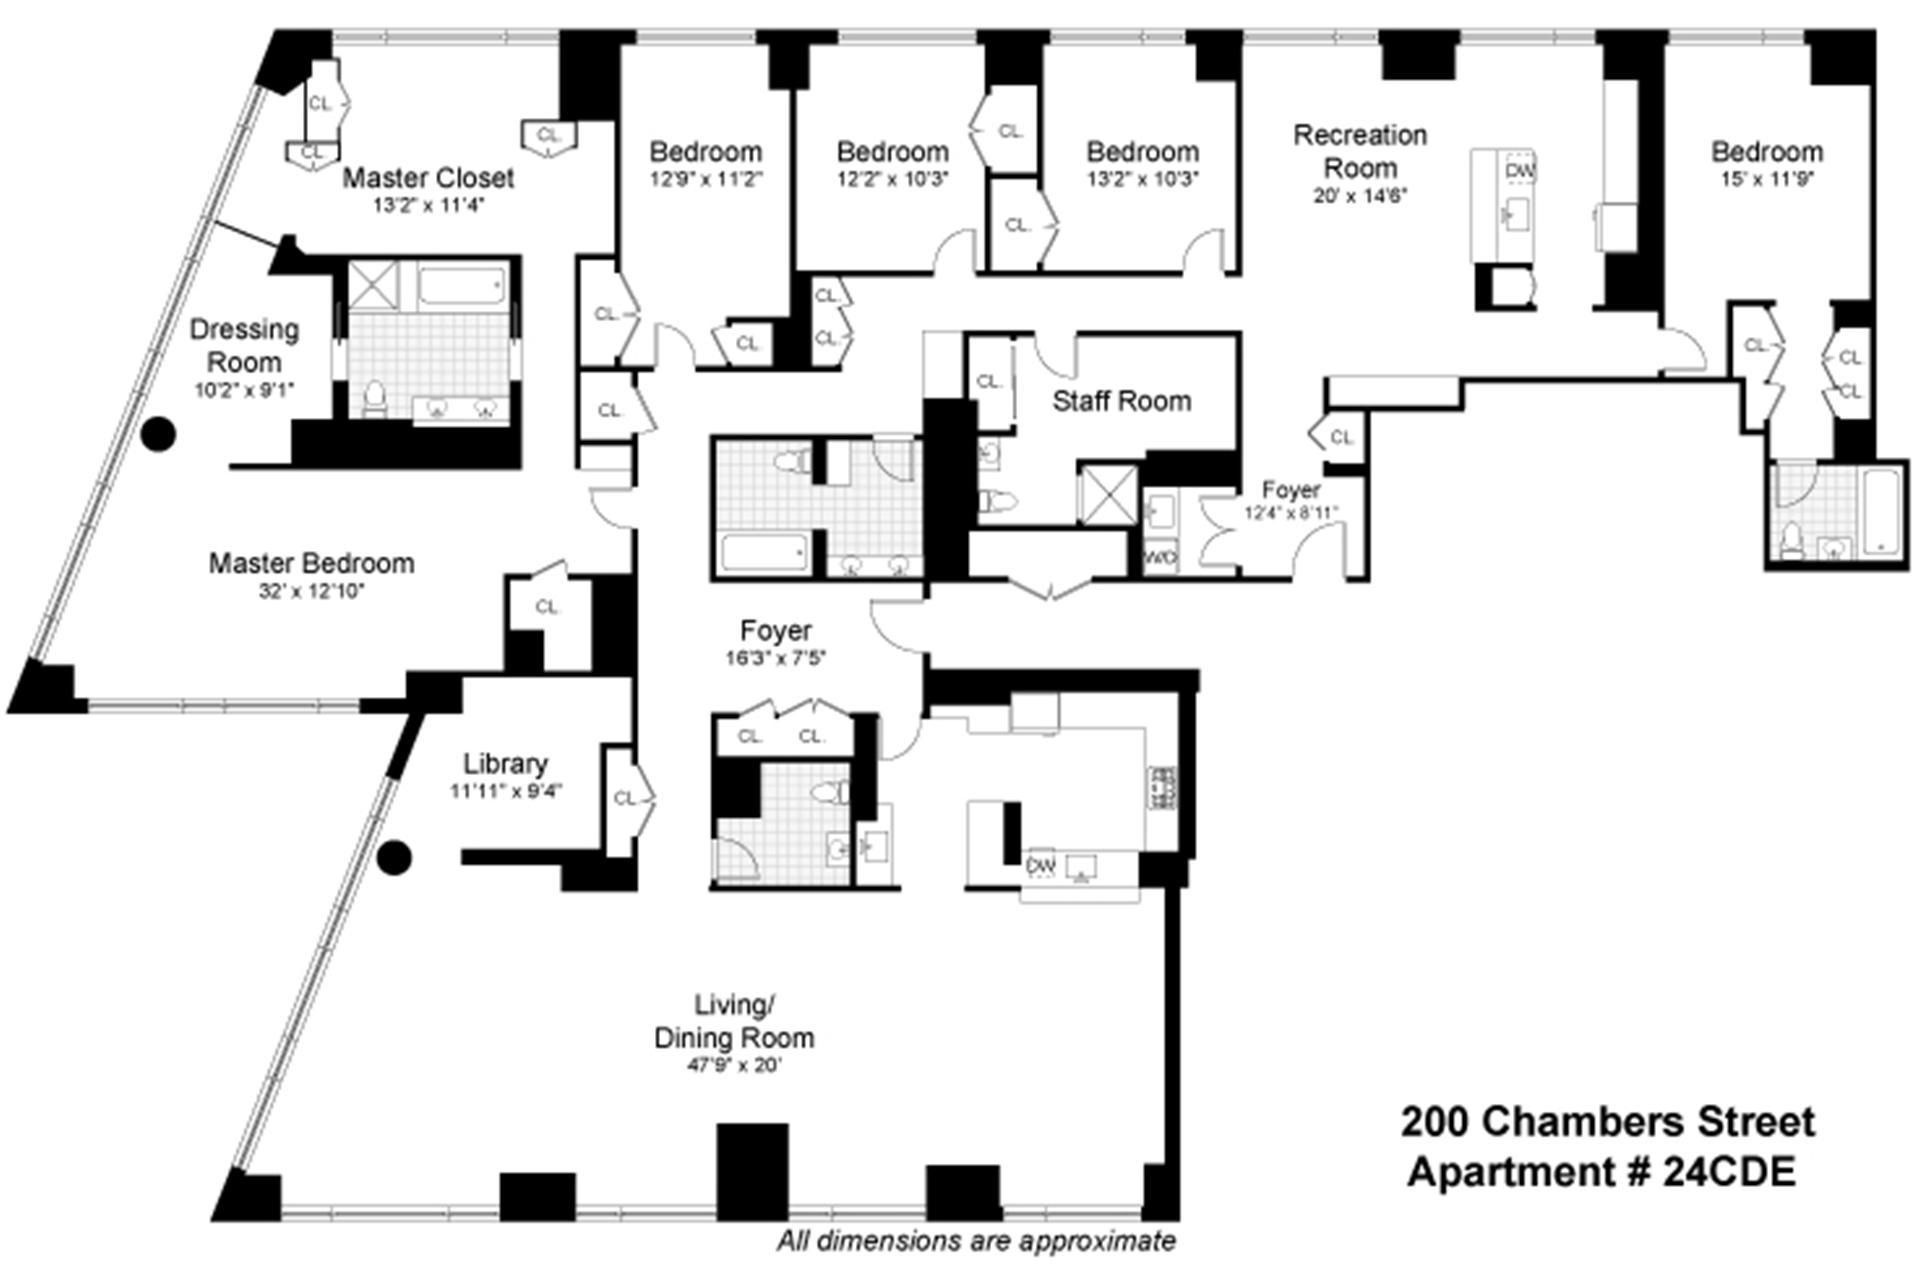 Floor plan of 200 Chambers St, 24CDE - TriBeCa, New York